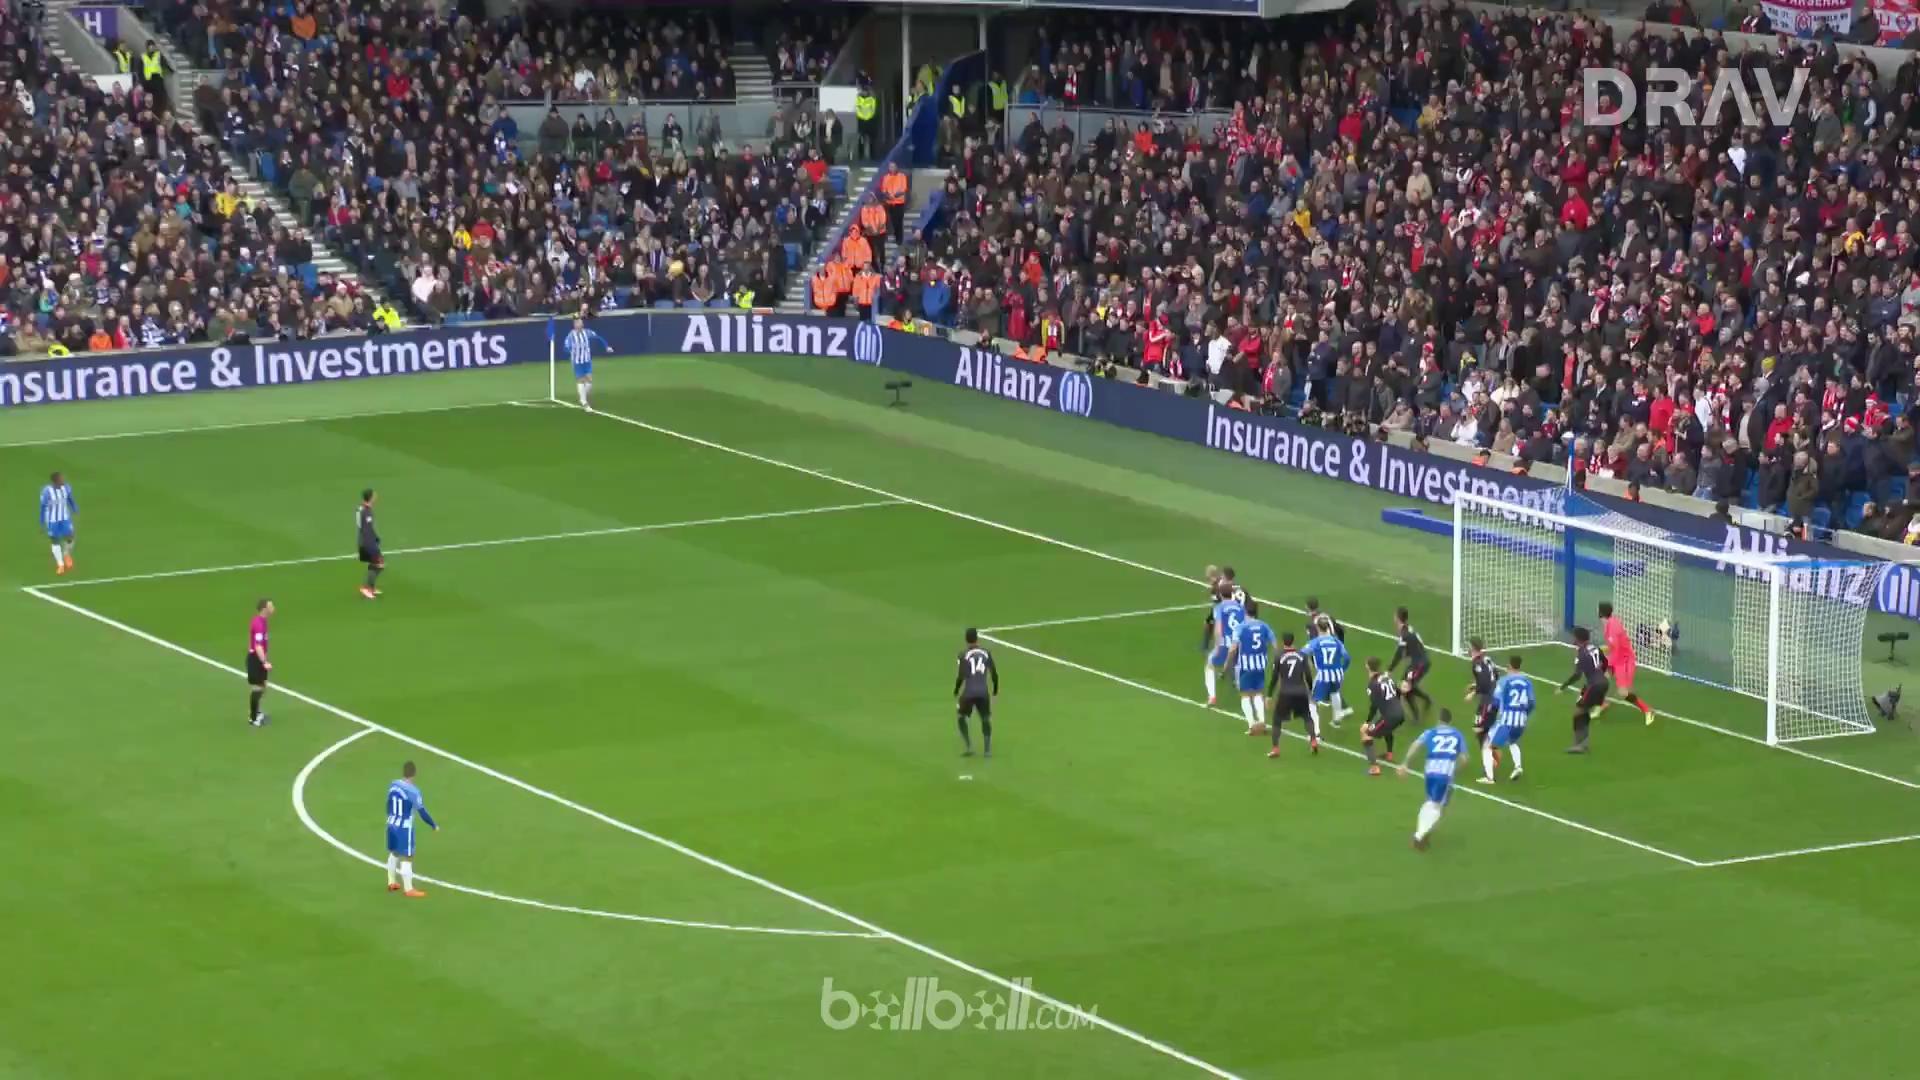 Barcelona 1 - 0 Atletico Madrid